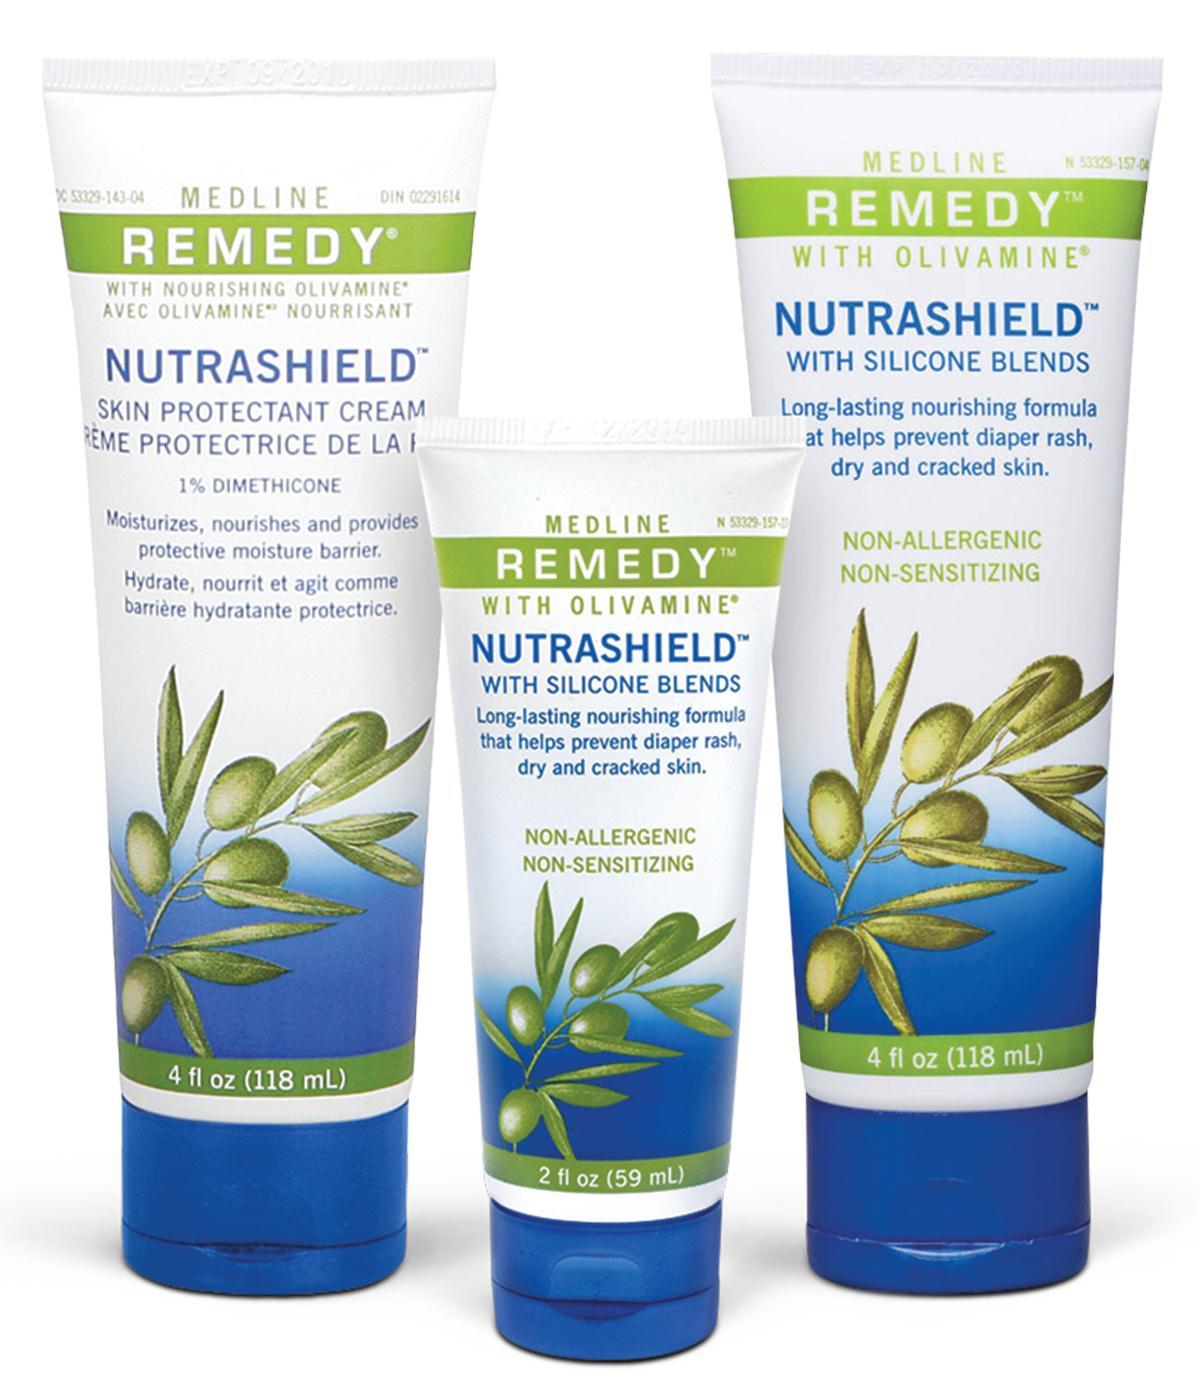 nourishment for damaged skin